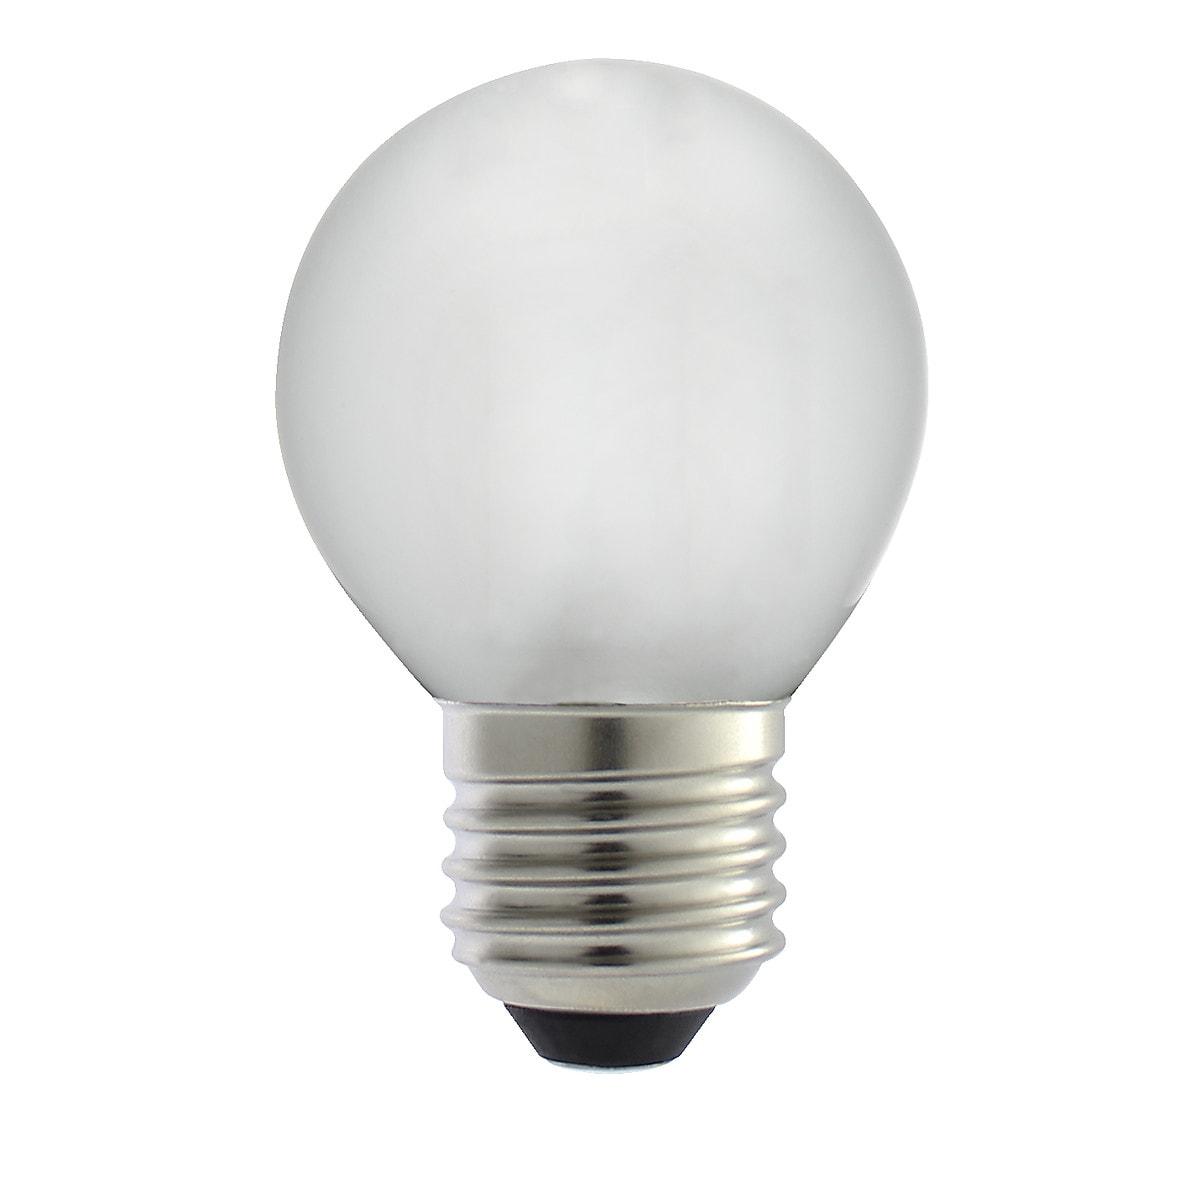 Dimbar klotlampa LED E27 Clas Ohlson